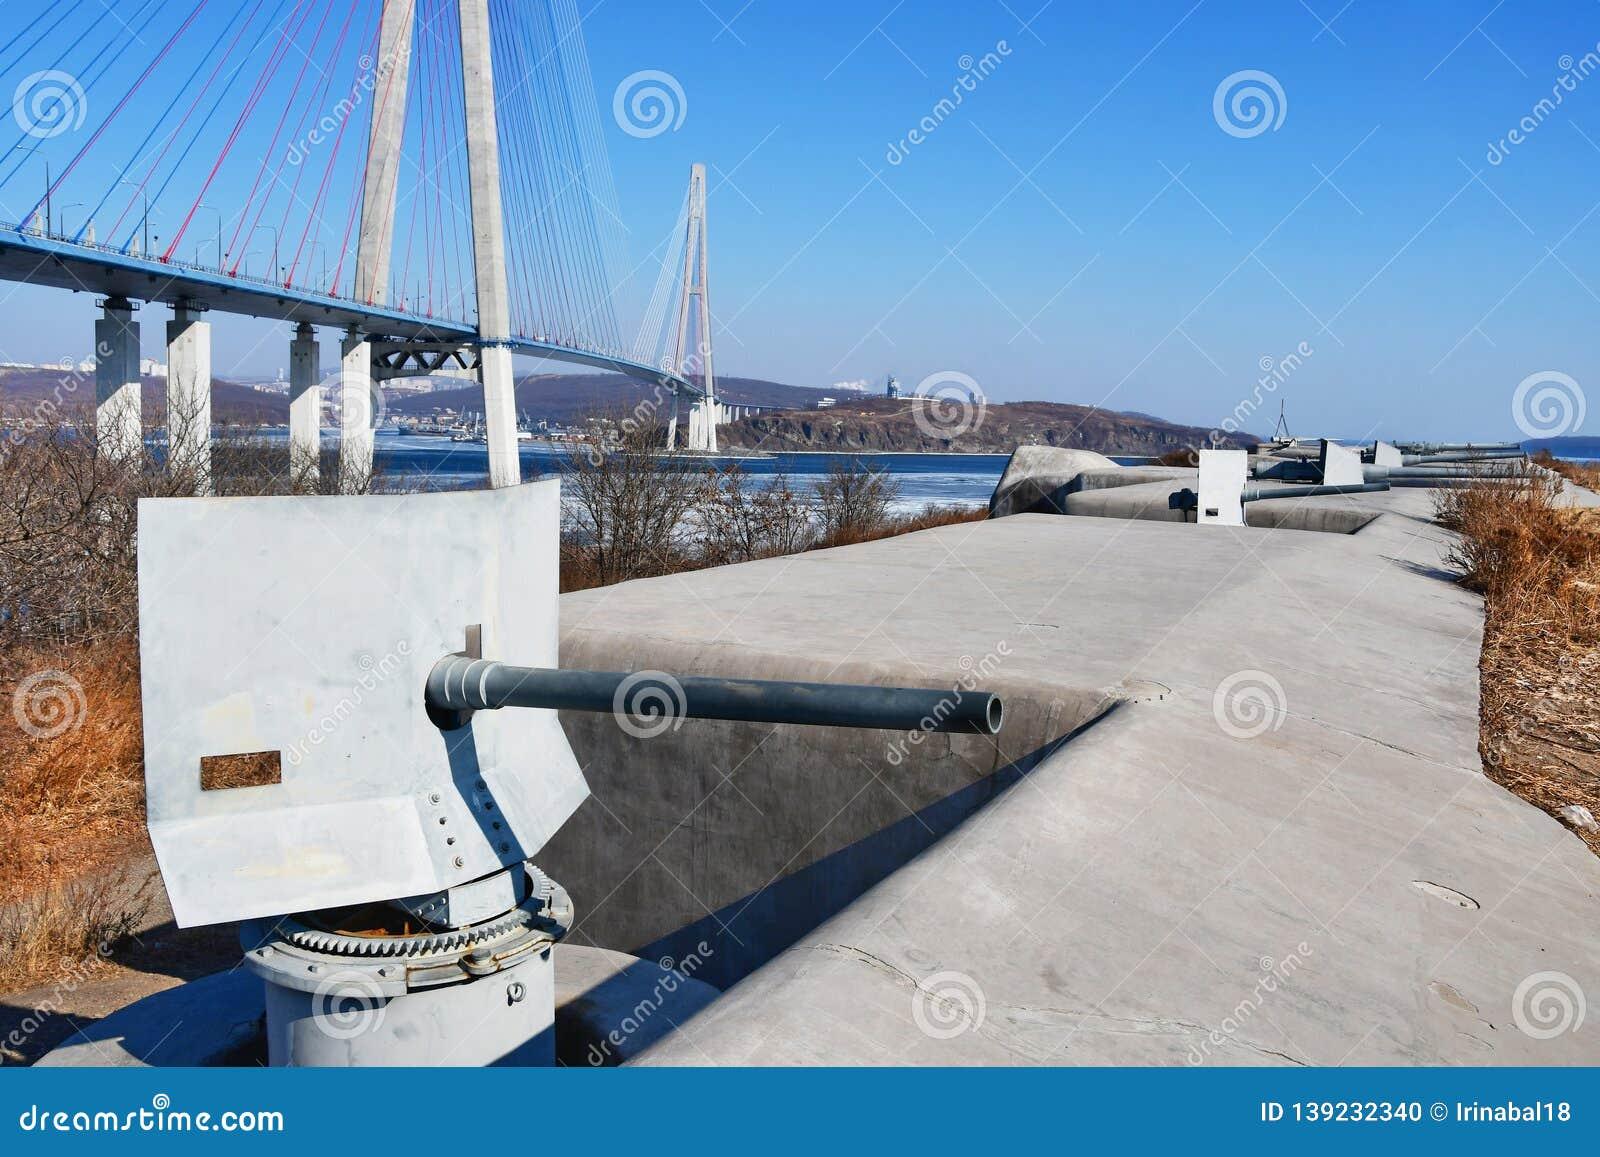 Cannons of the Novosiltsevskaya coastal battery of the Vladivostok fortress of beginning of 20 century on Russkiy island in Vladiv